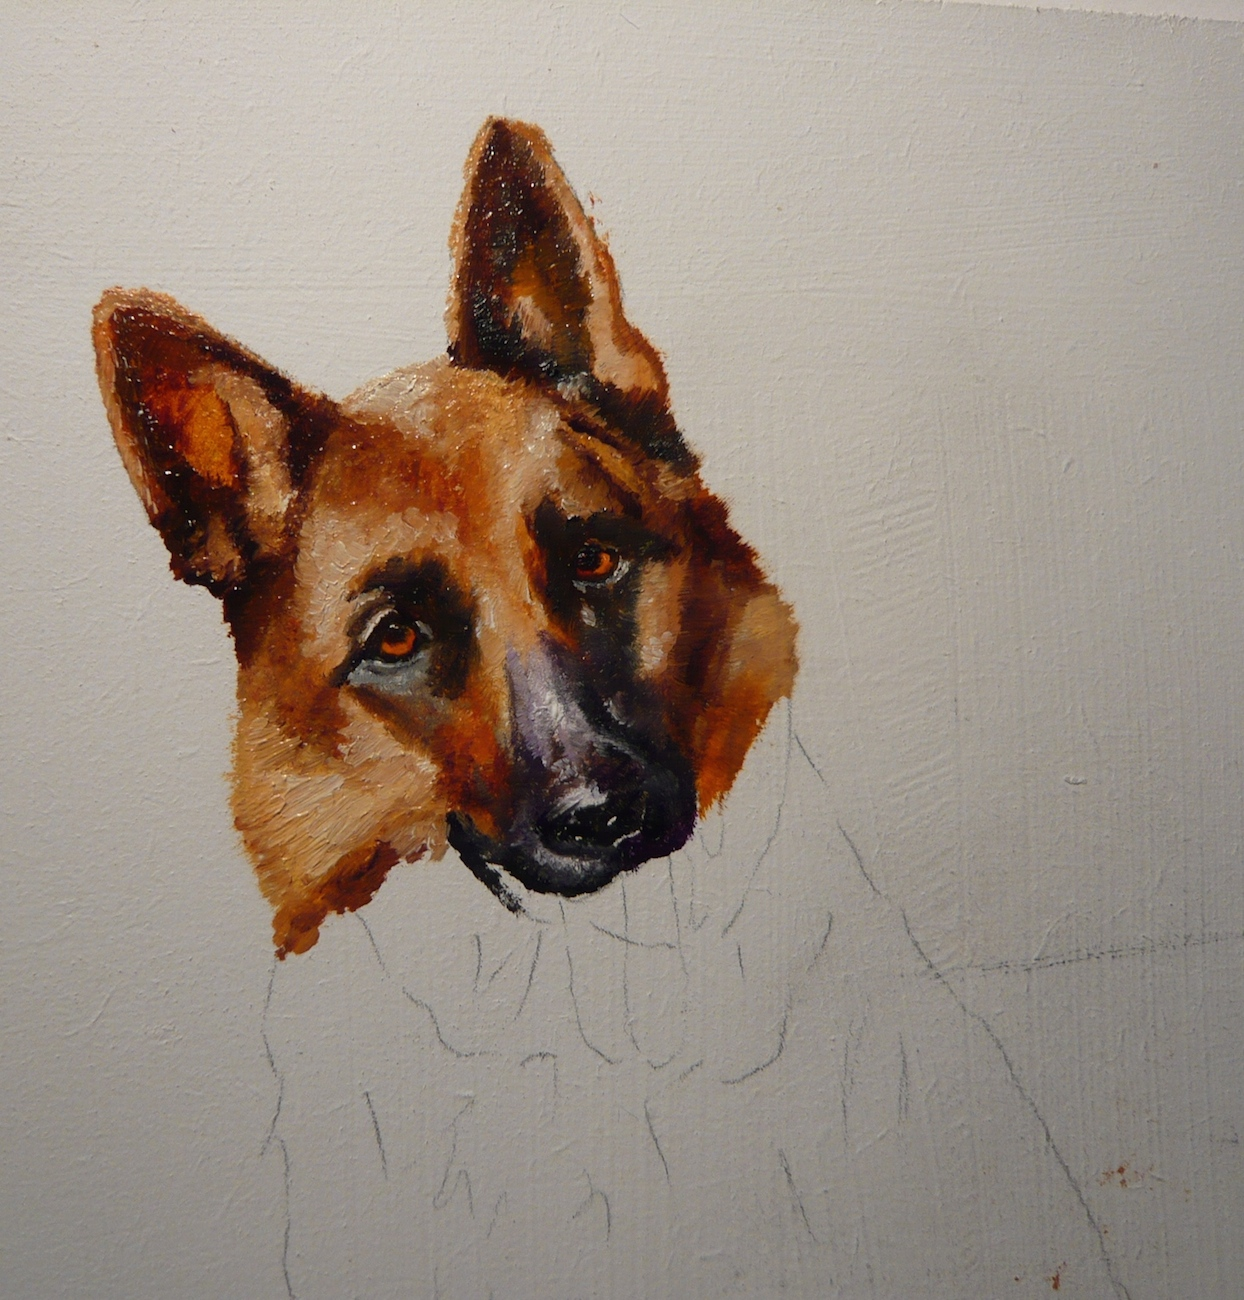 oil painting of a German Shepherd: work-in-progress stage 3. A pet painting by Karen.